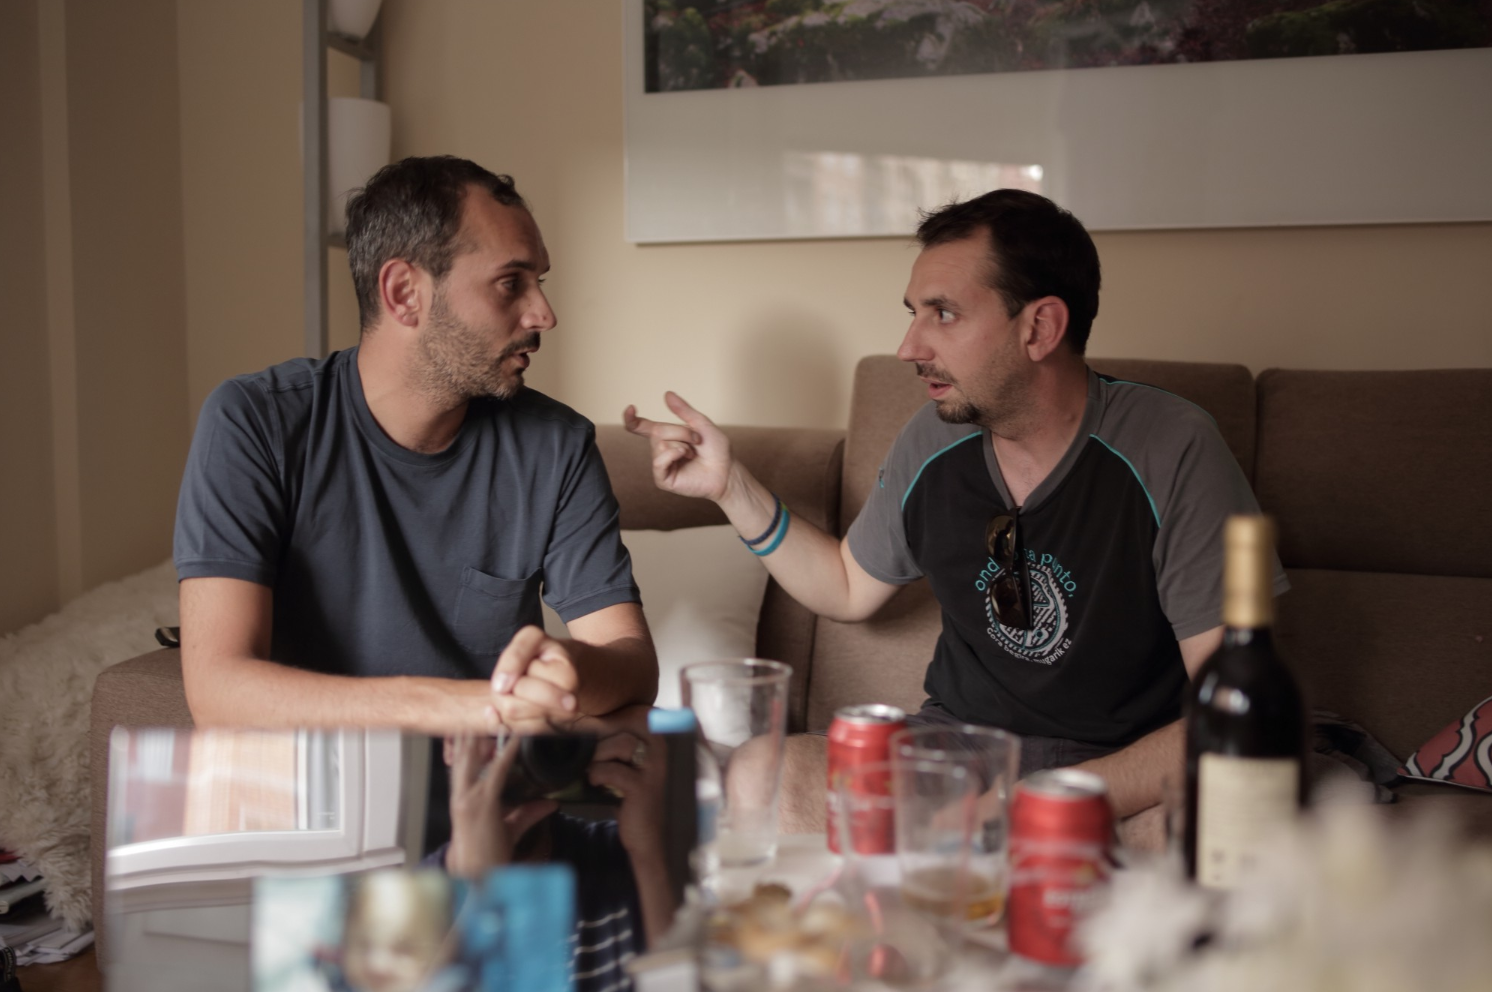 Roberto Bruccoleri a sinistra, Beniat sulla destra. ManueleGeromini©️